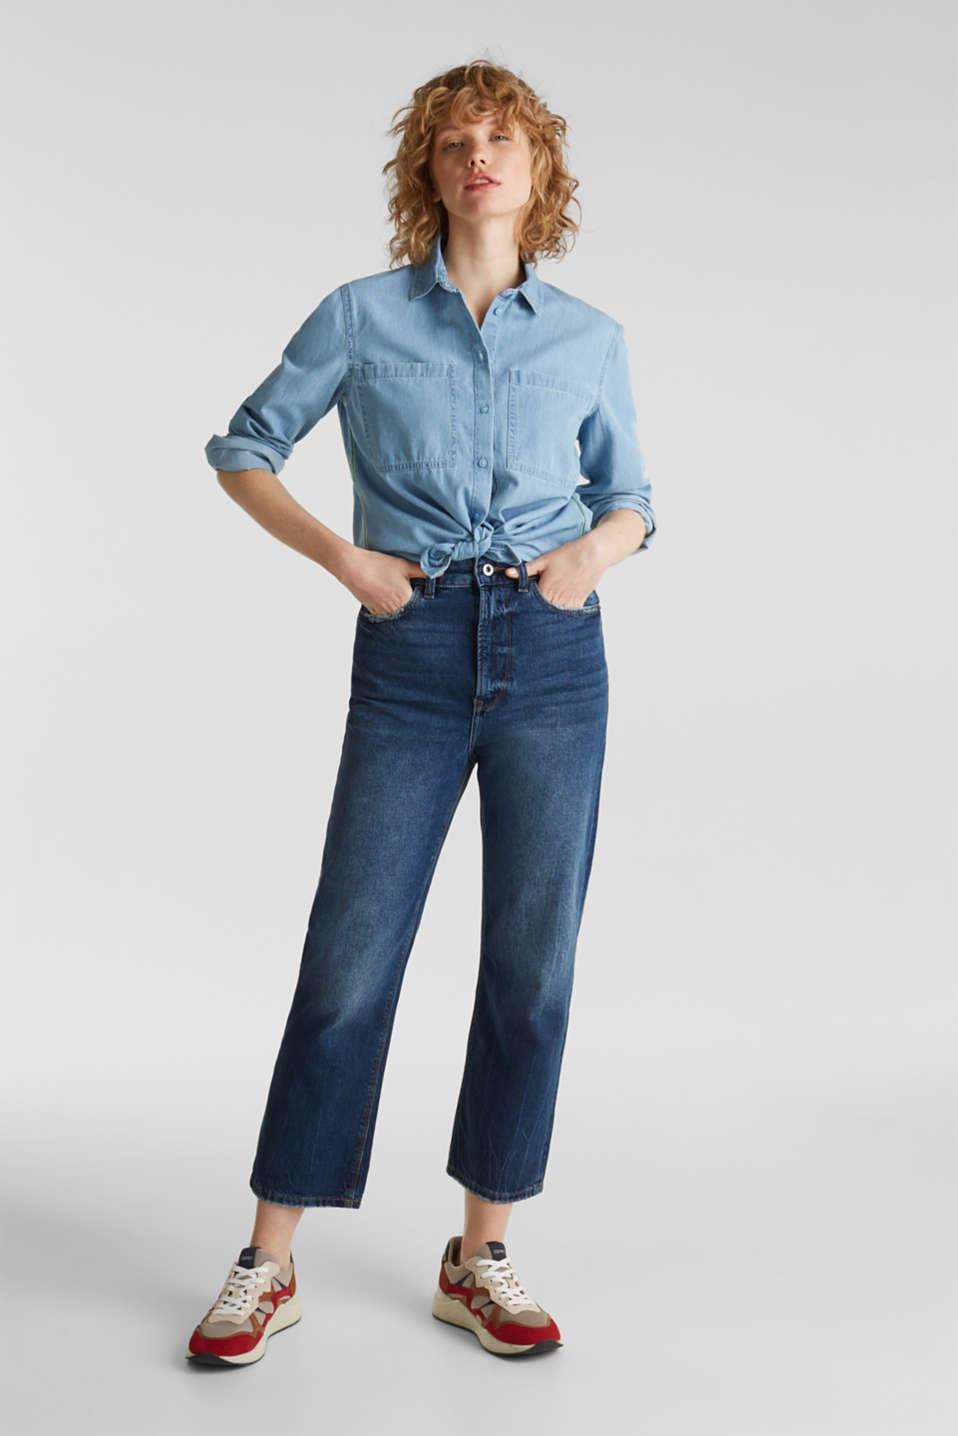 Bleached denim shirt with pockets, 100% cotton, BLUE LIGHT WASH, detail image number 1